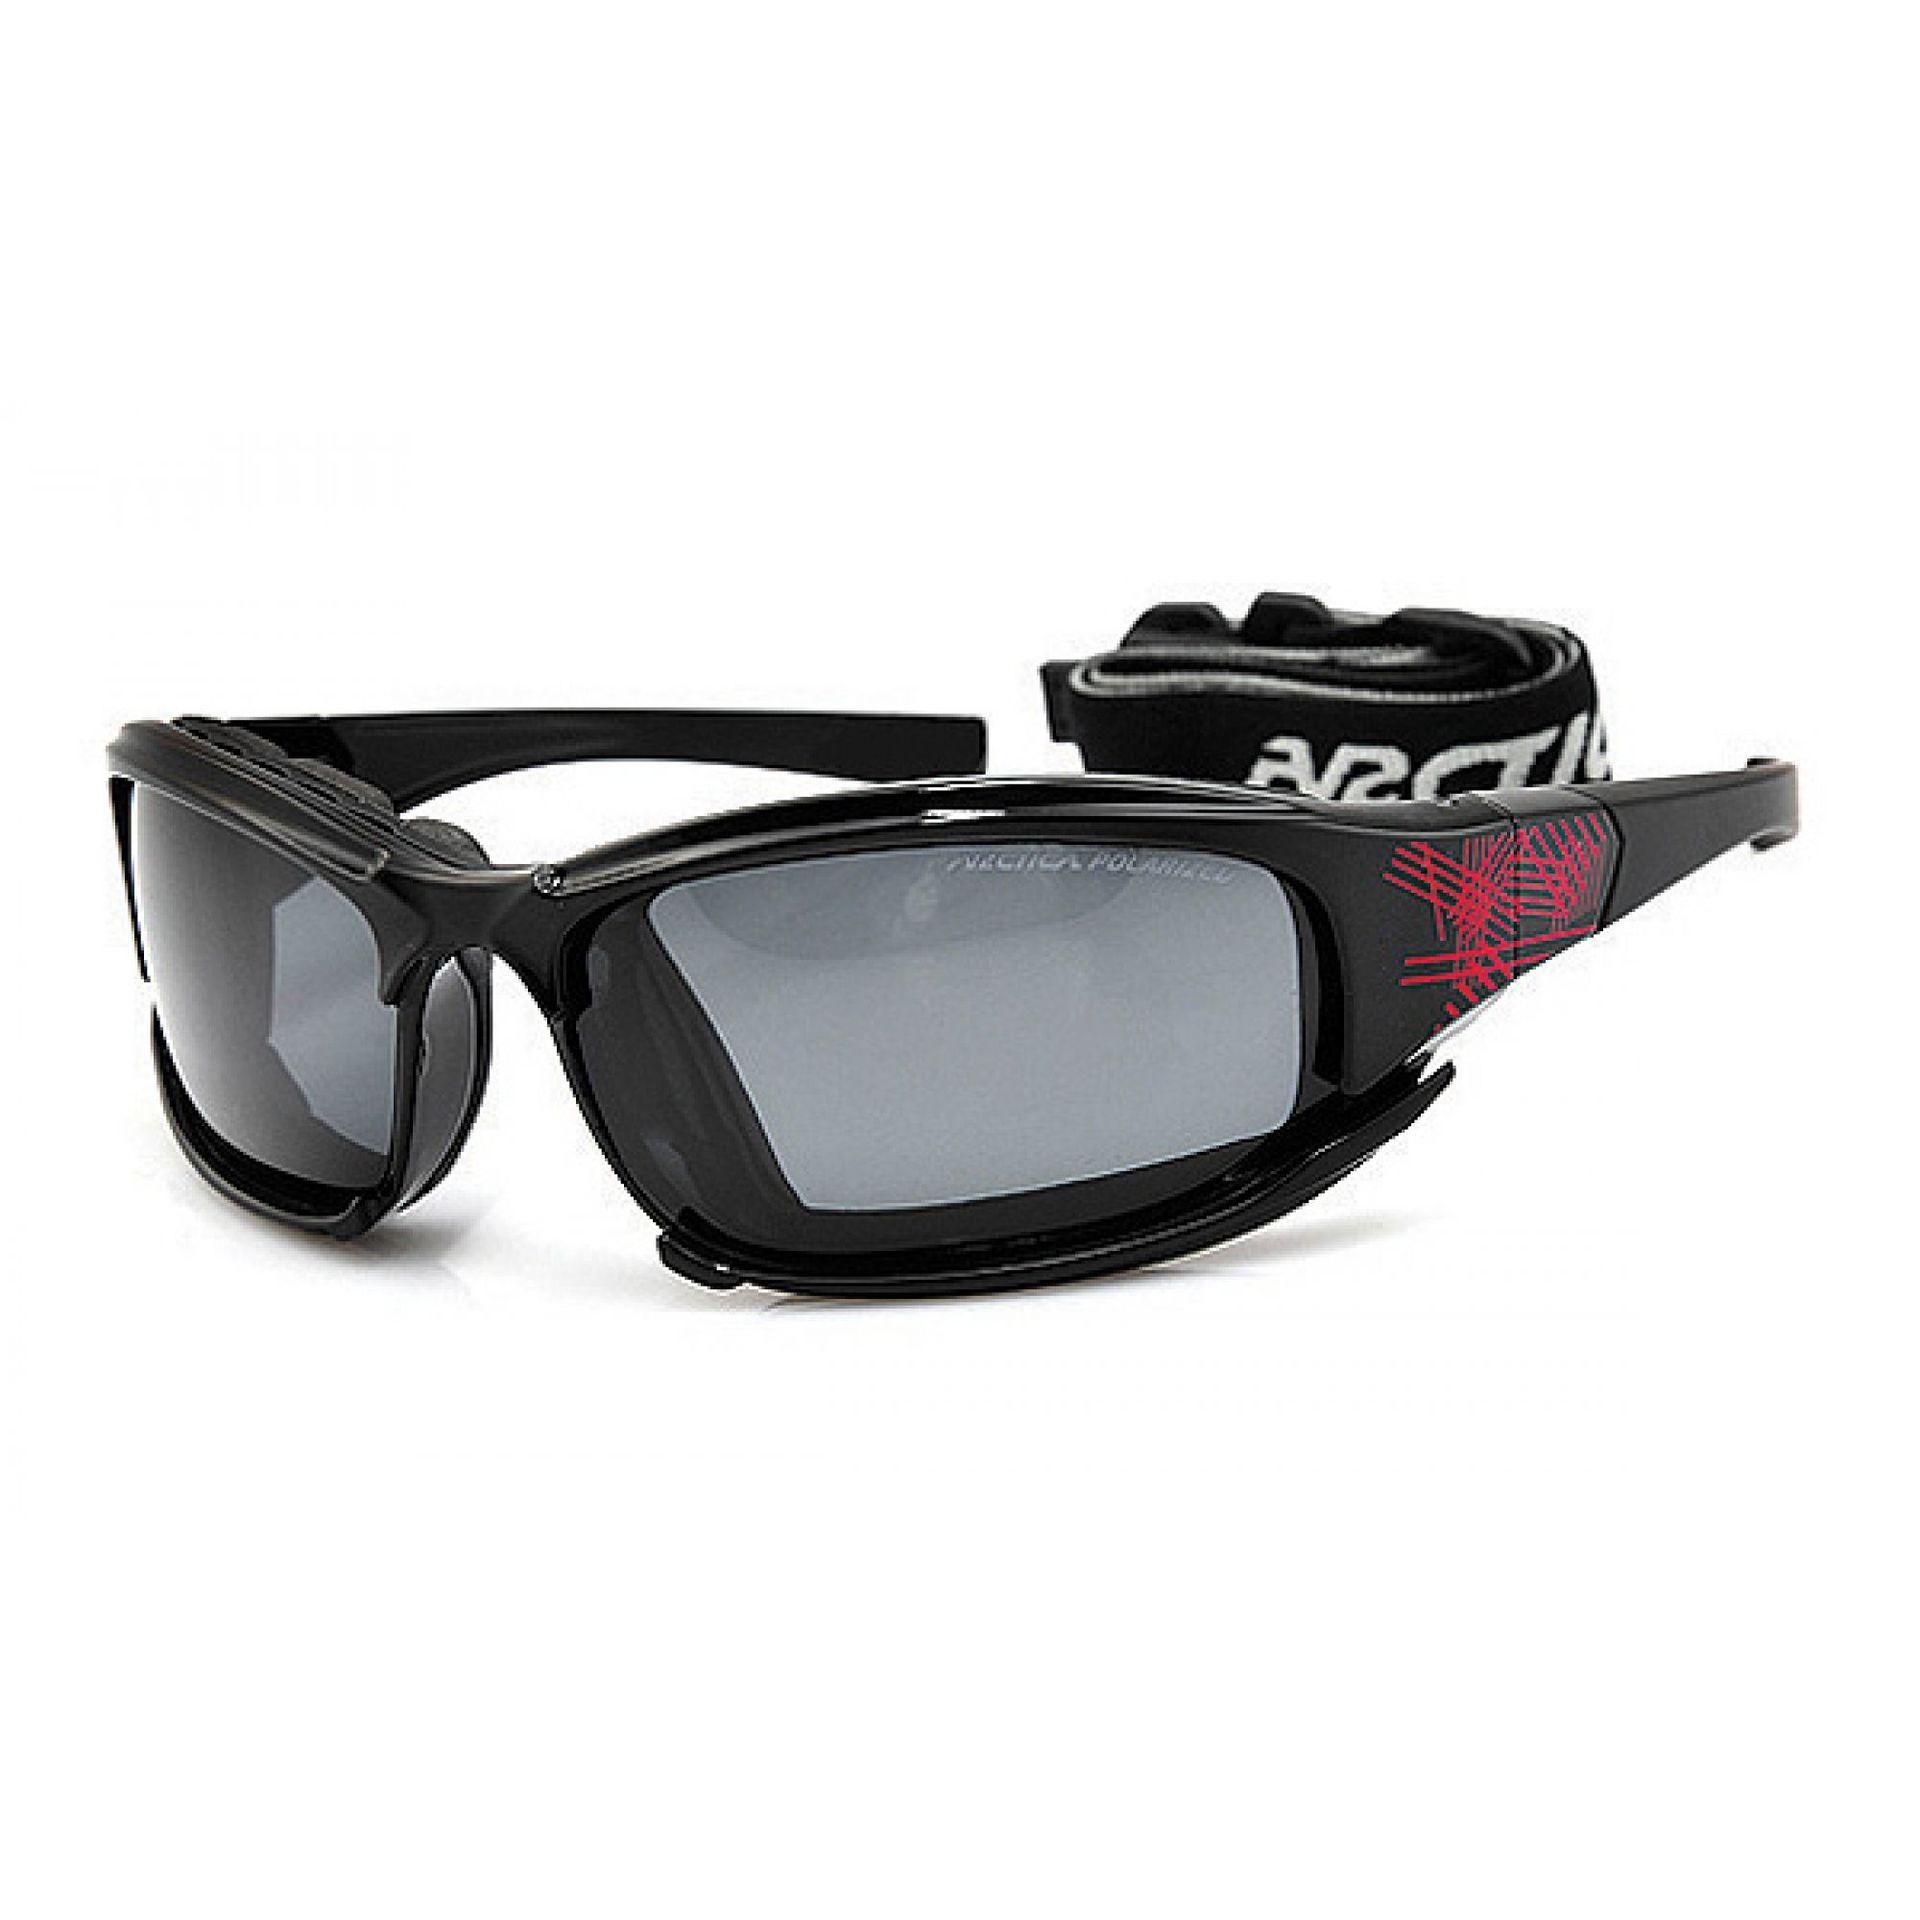 Okulary Arctica S-164B czarne